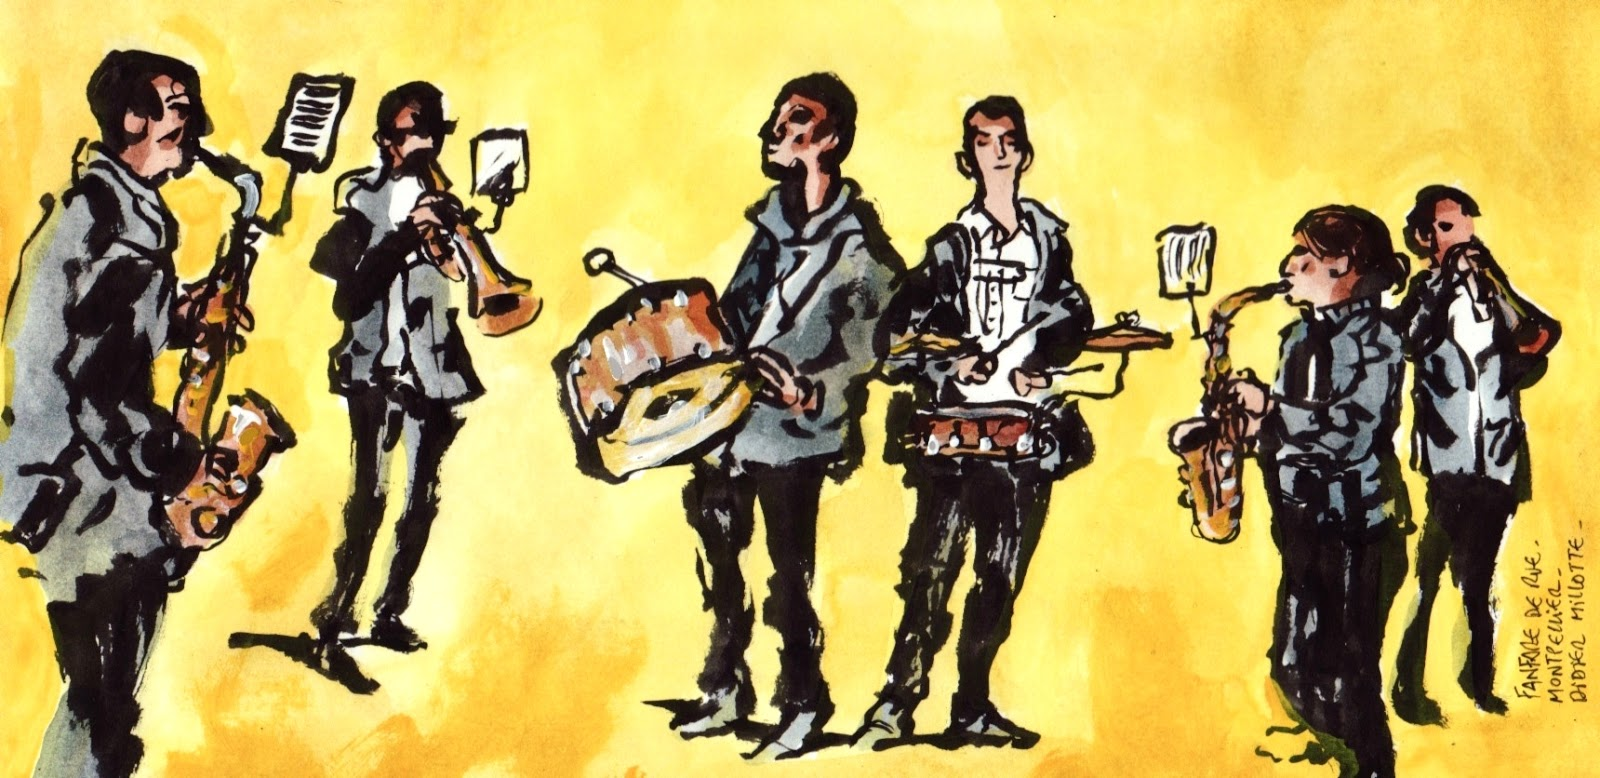 Rencontre musicien montpellier